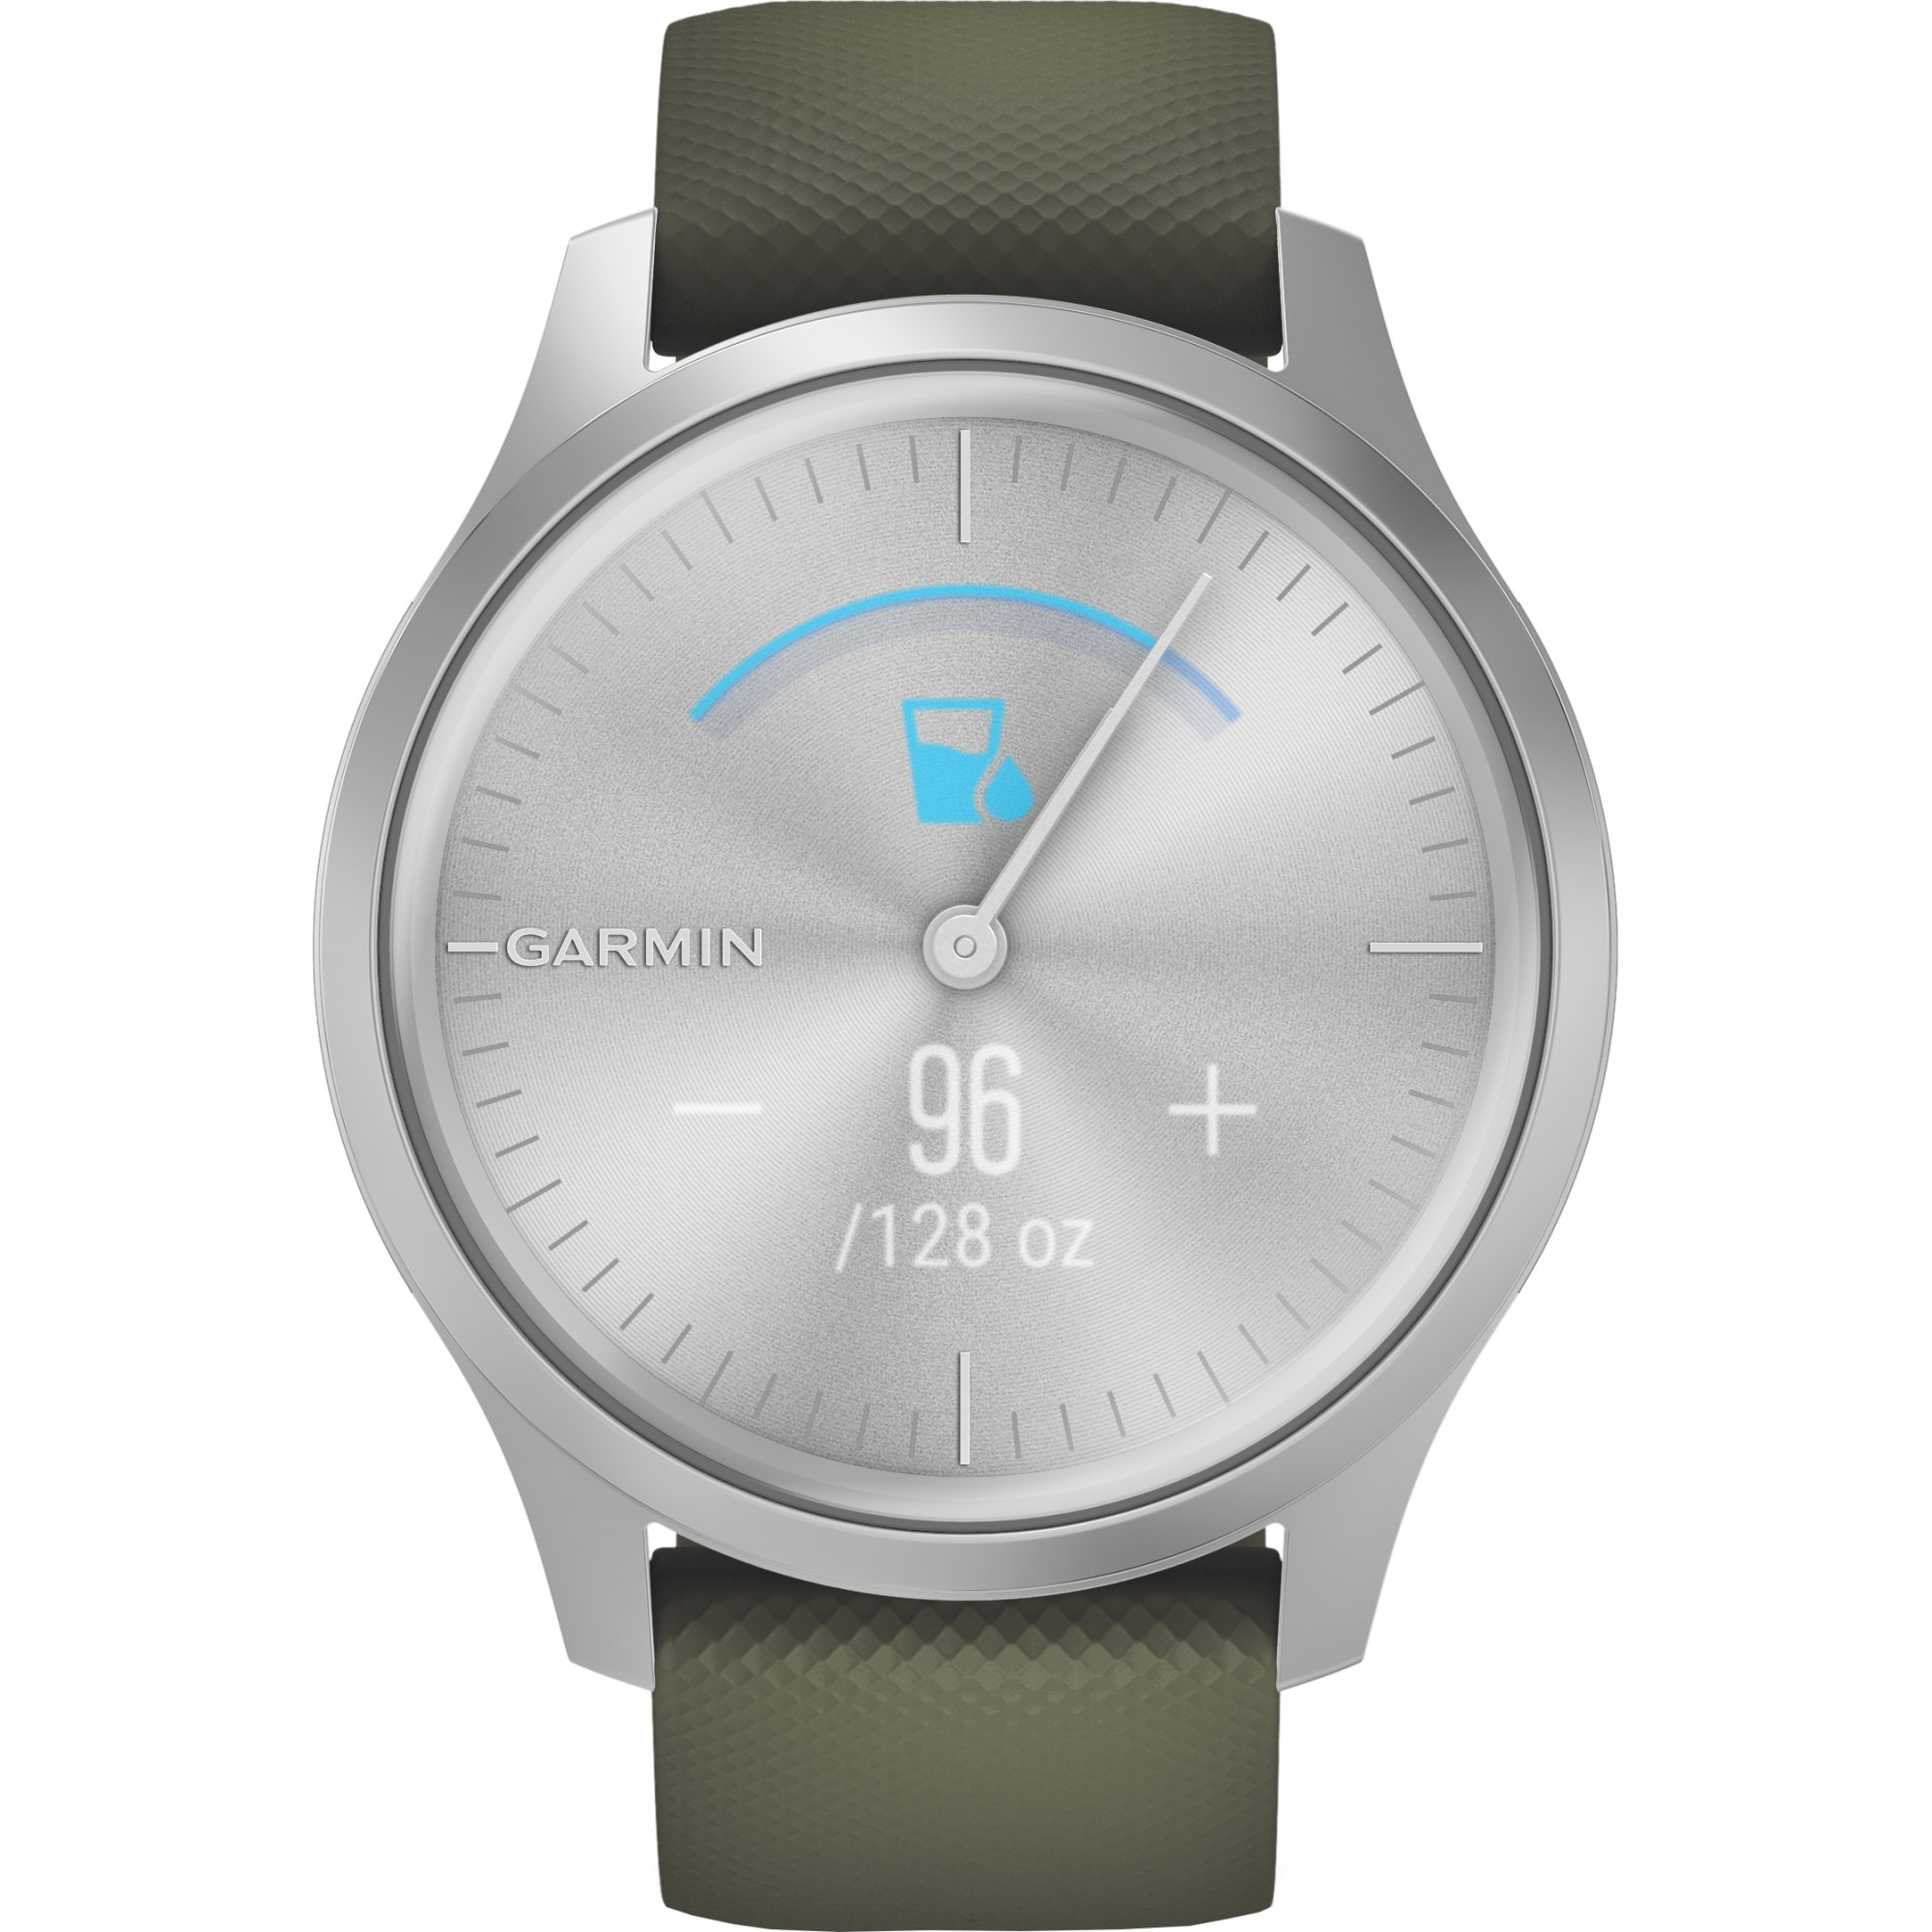 Fotografie Ceas Smartwatch Garmin Vivomove Style, Silver/Moss Green, Silicone Band